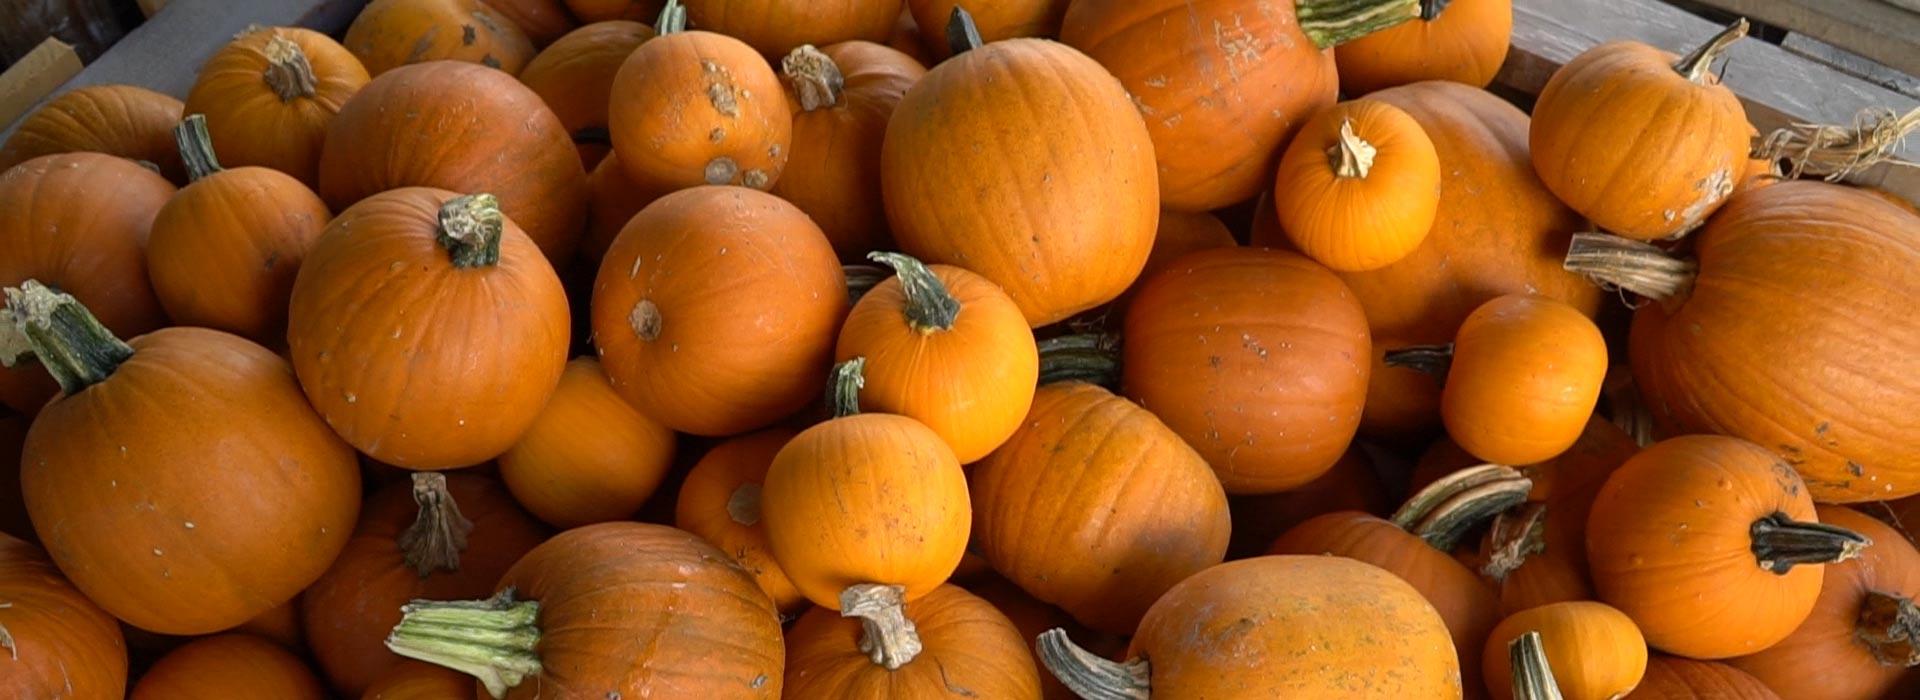 Pumpkins & Fall Décor